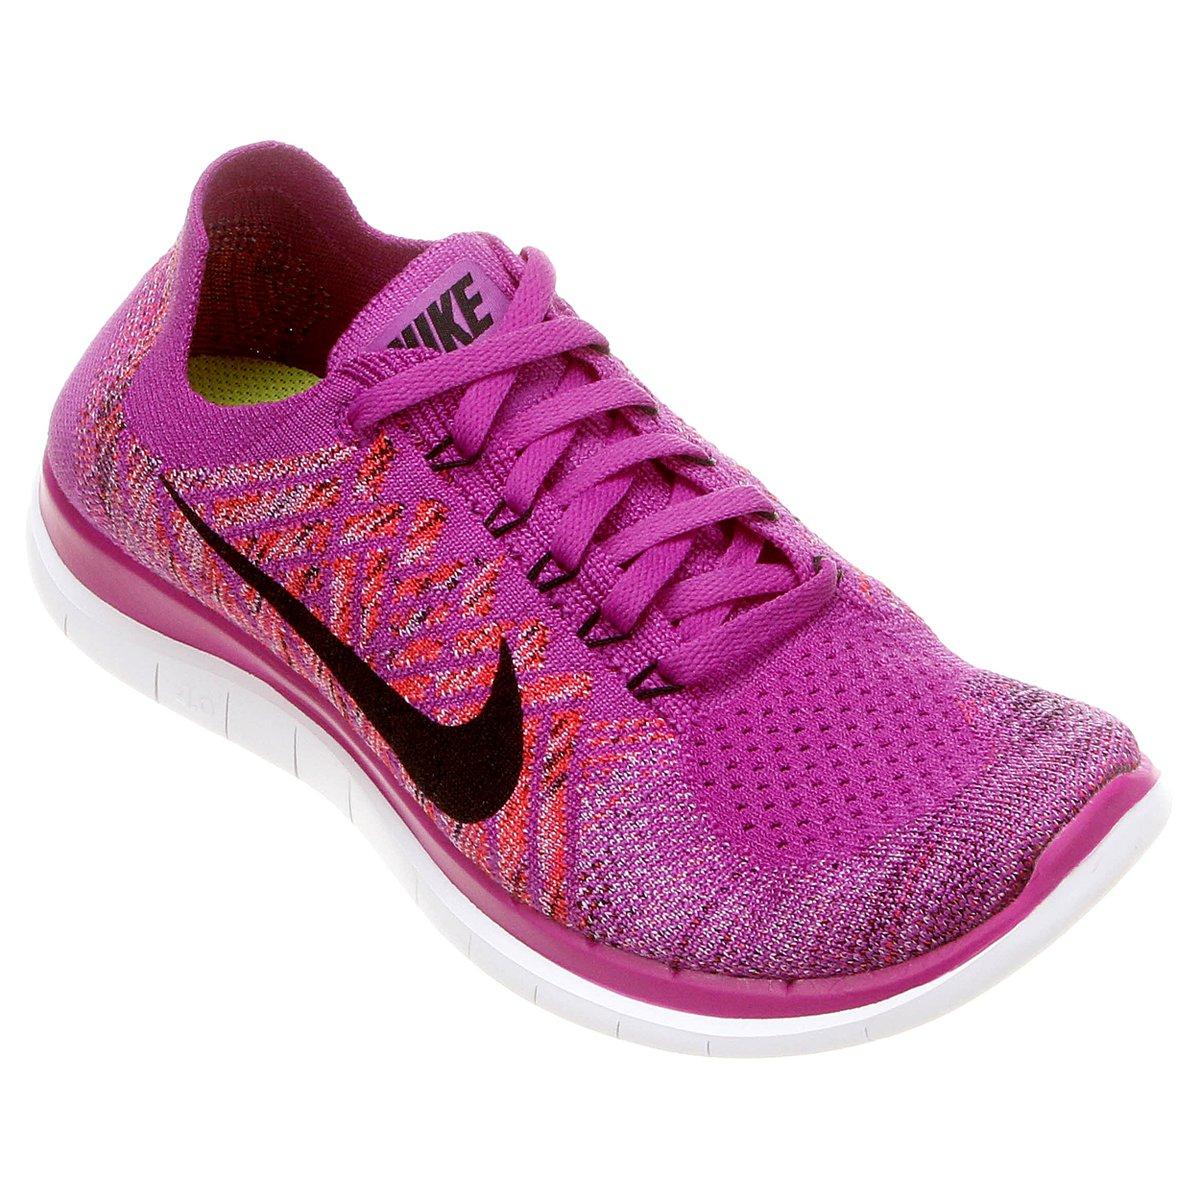 163f09331ab Tênis Nike Free 4.0 Flyknit - Compre Agora